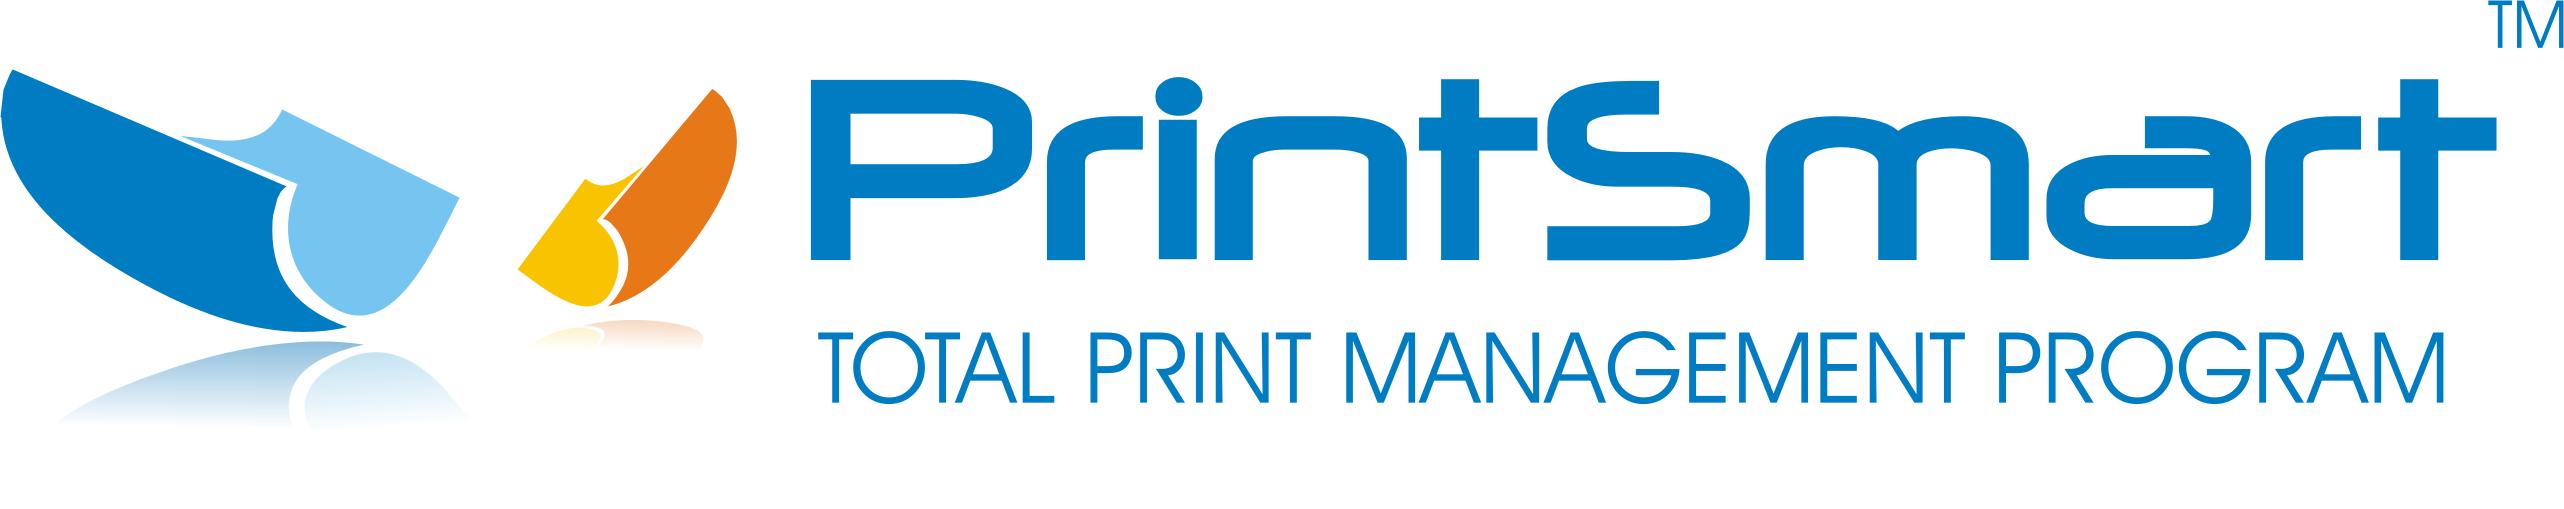 Total Print Management Program